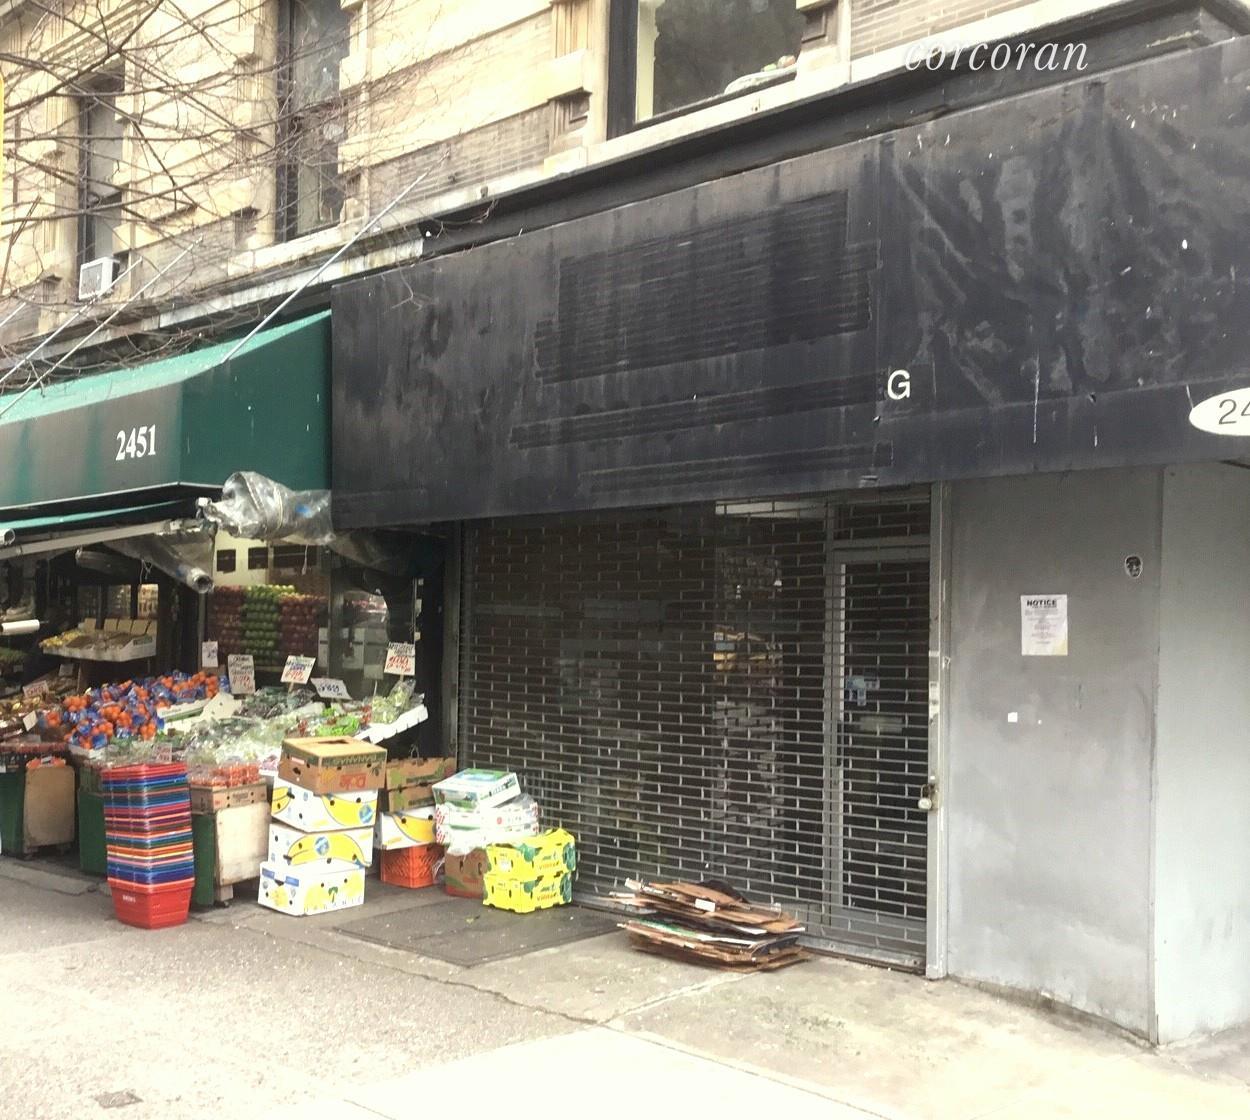 250 West 91st Street